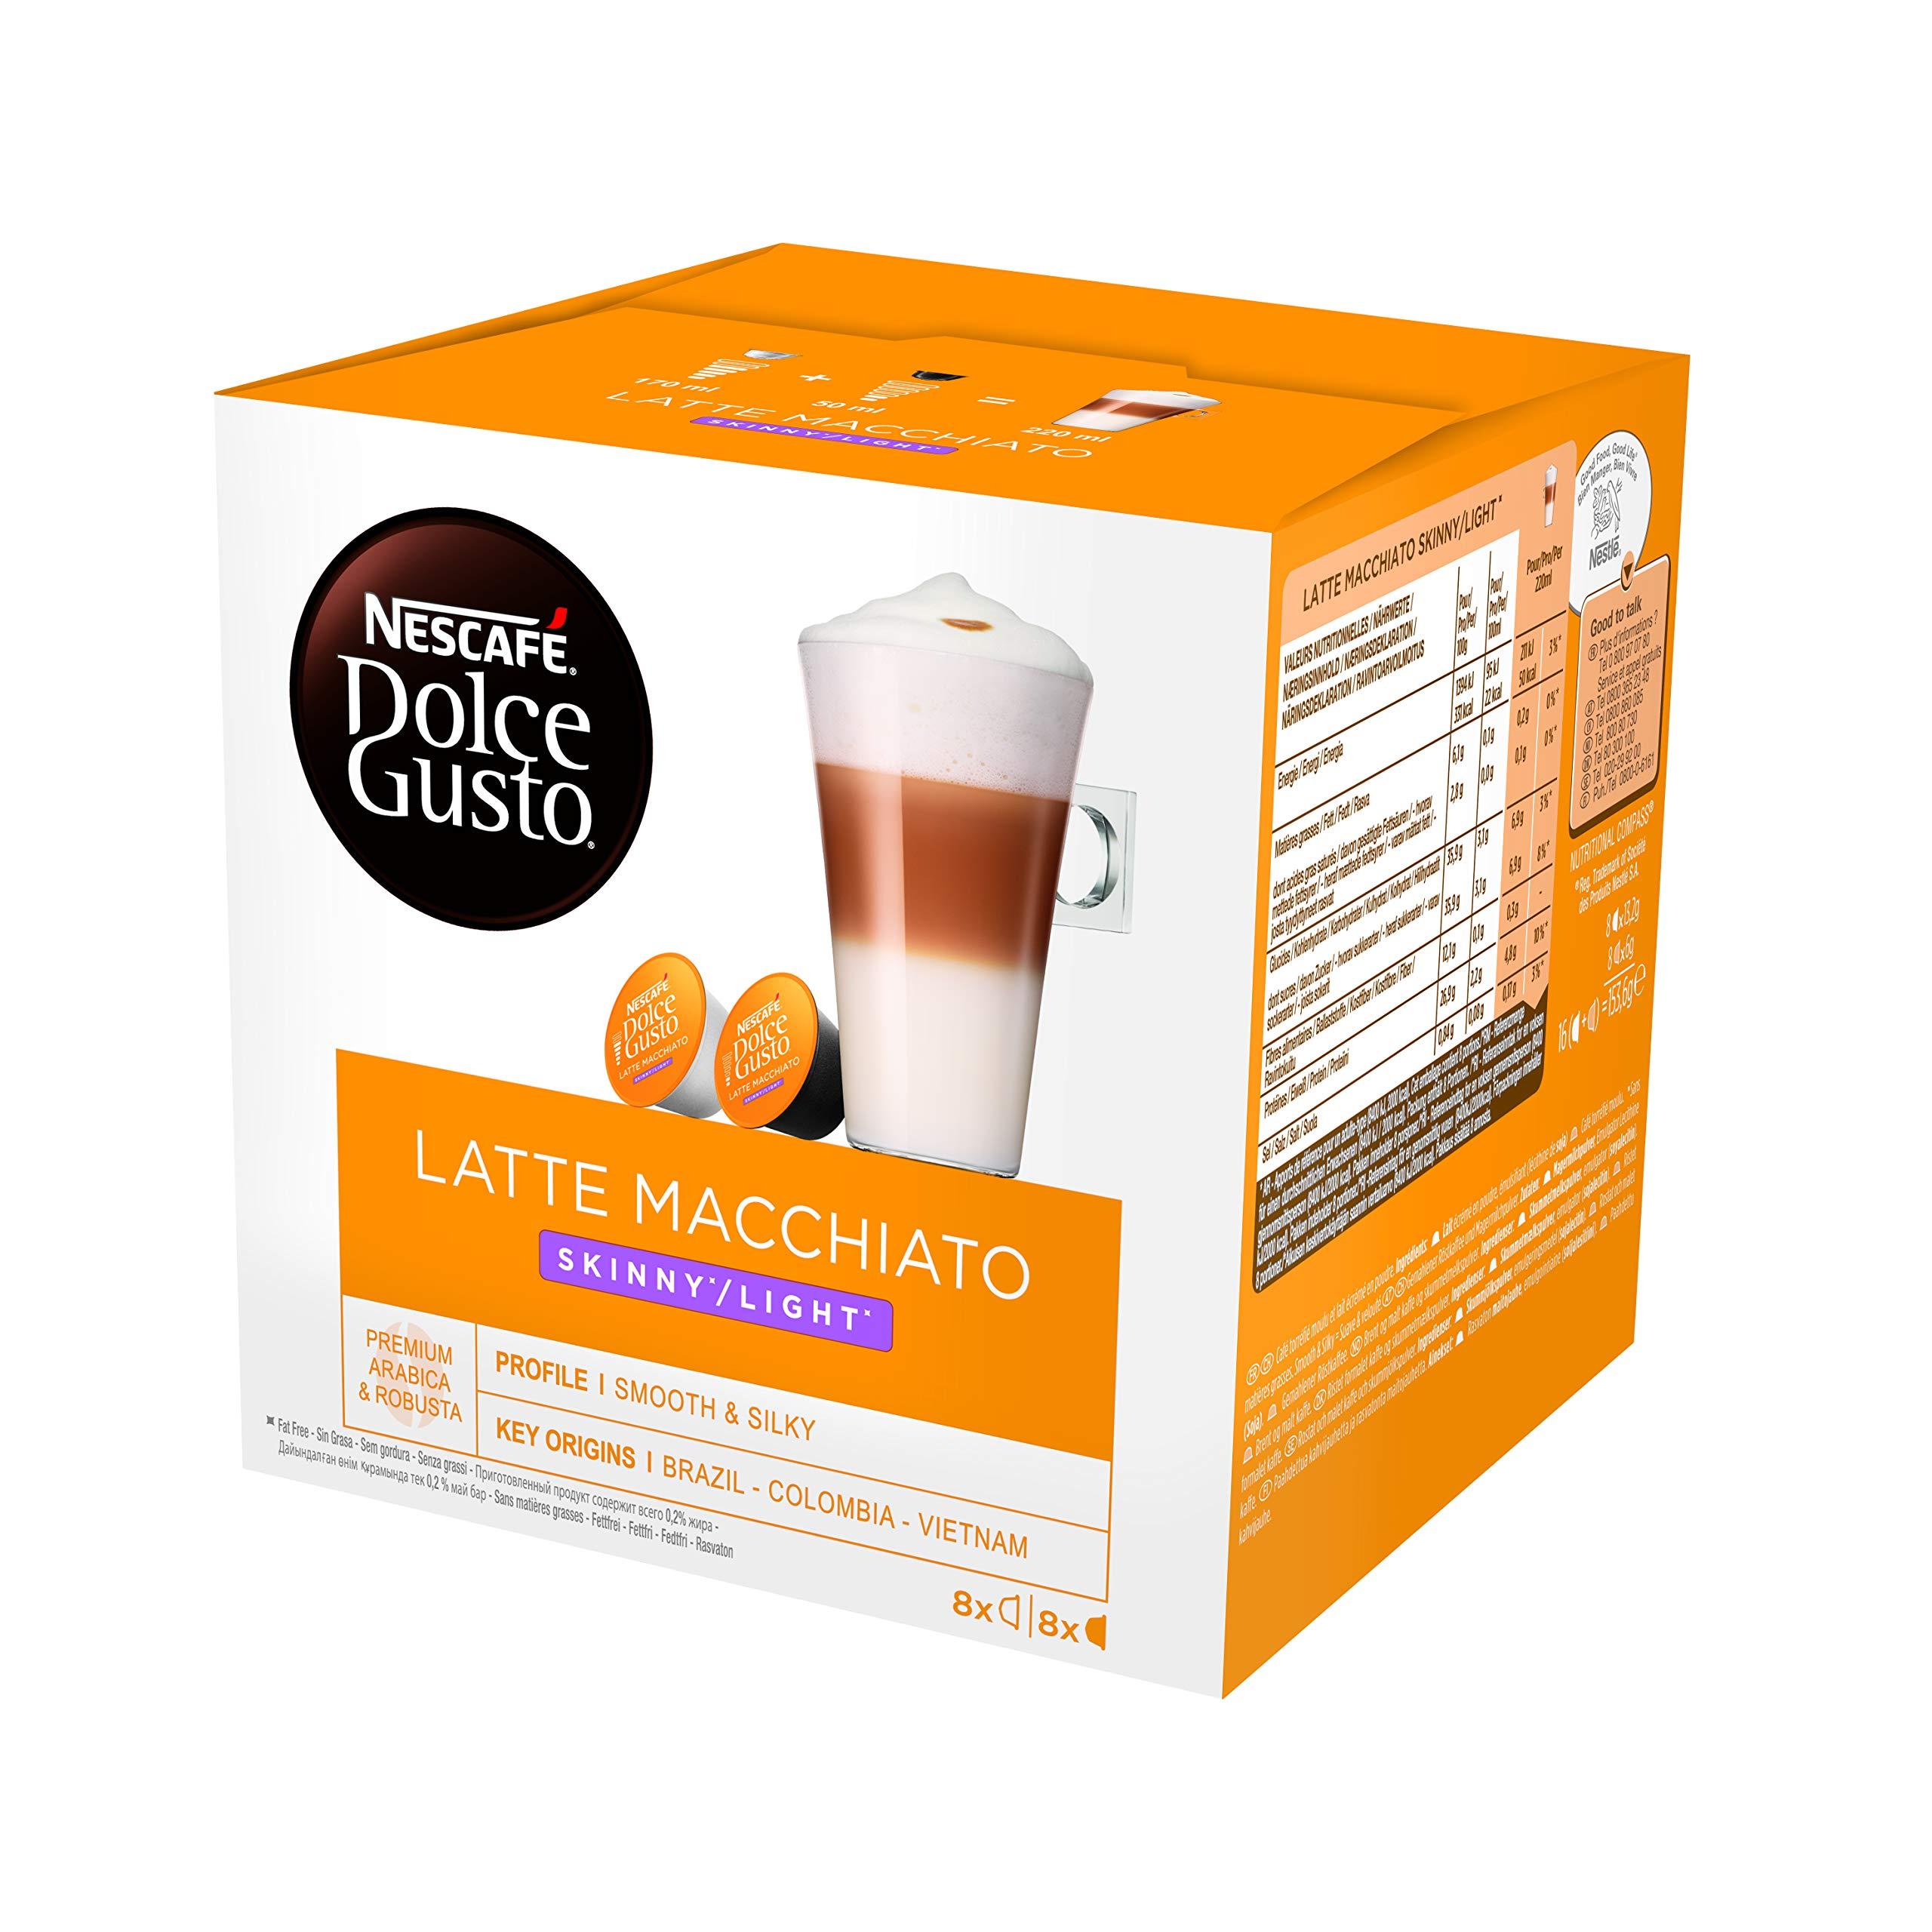 NESCAFÉ Dolce Gusto Skinny Latte Macchiato Coffee Pods, 16 Capsules (Pack of 3, Total 48 Capsules, 24 Servings)